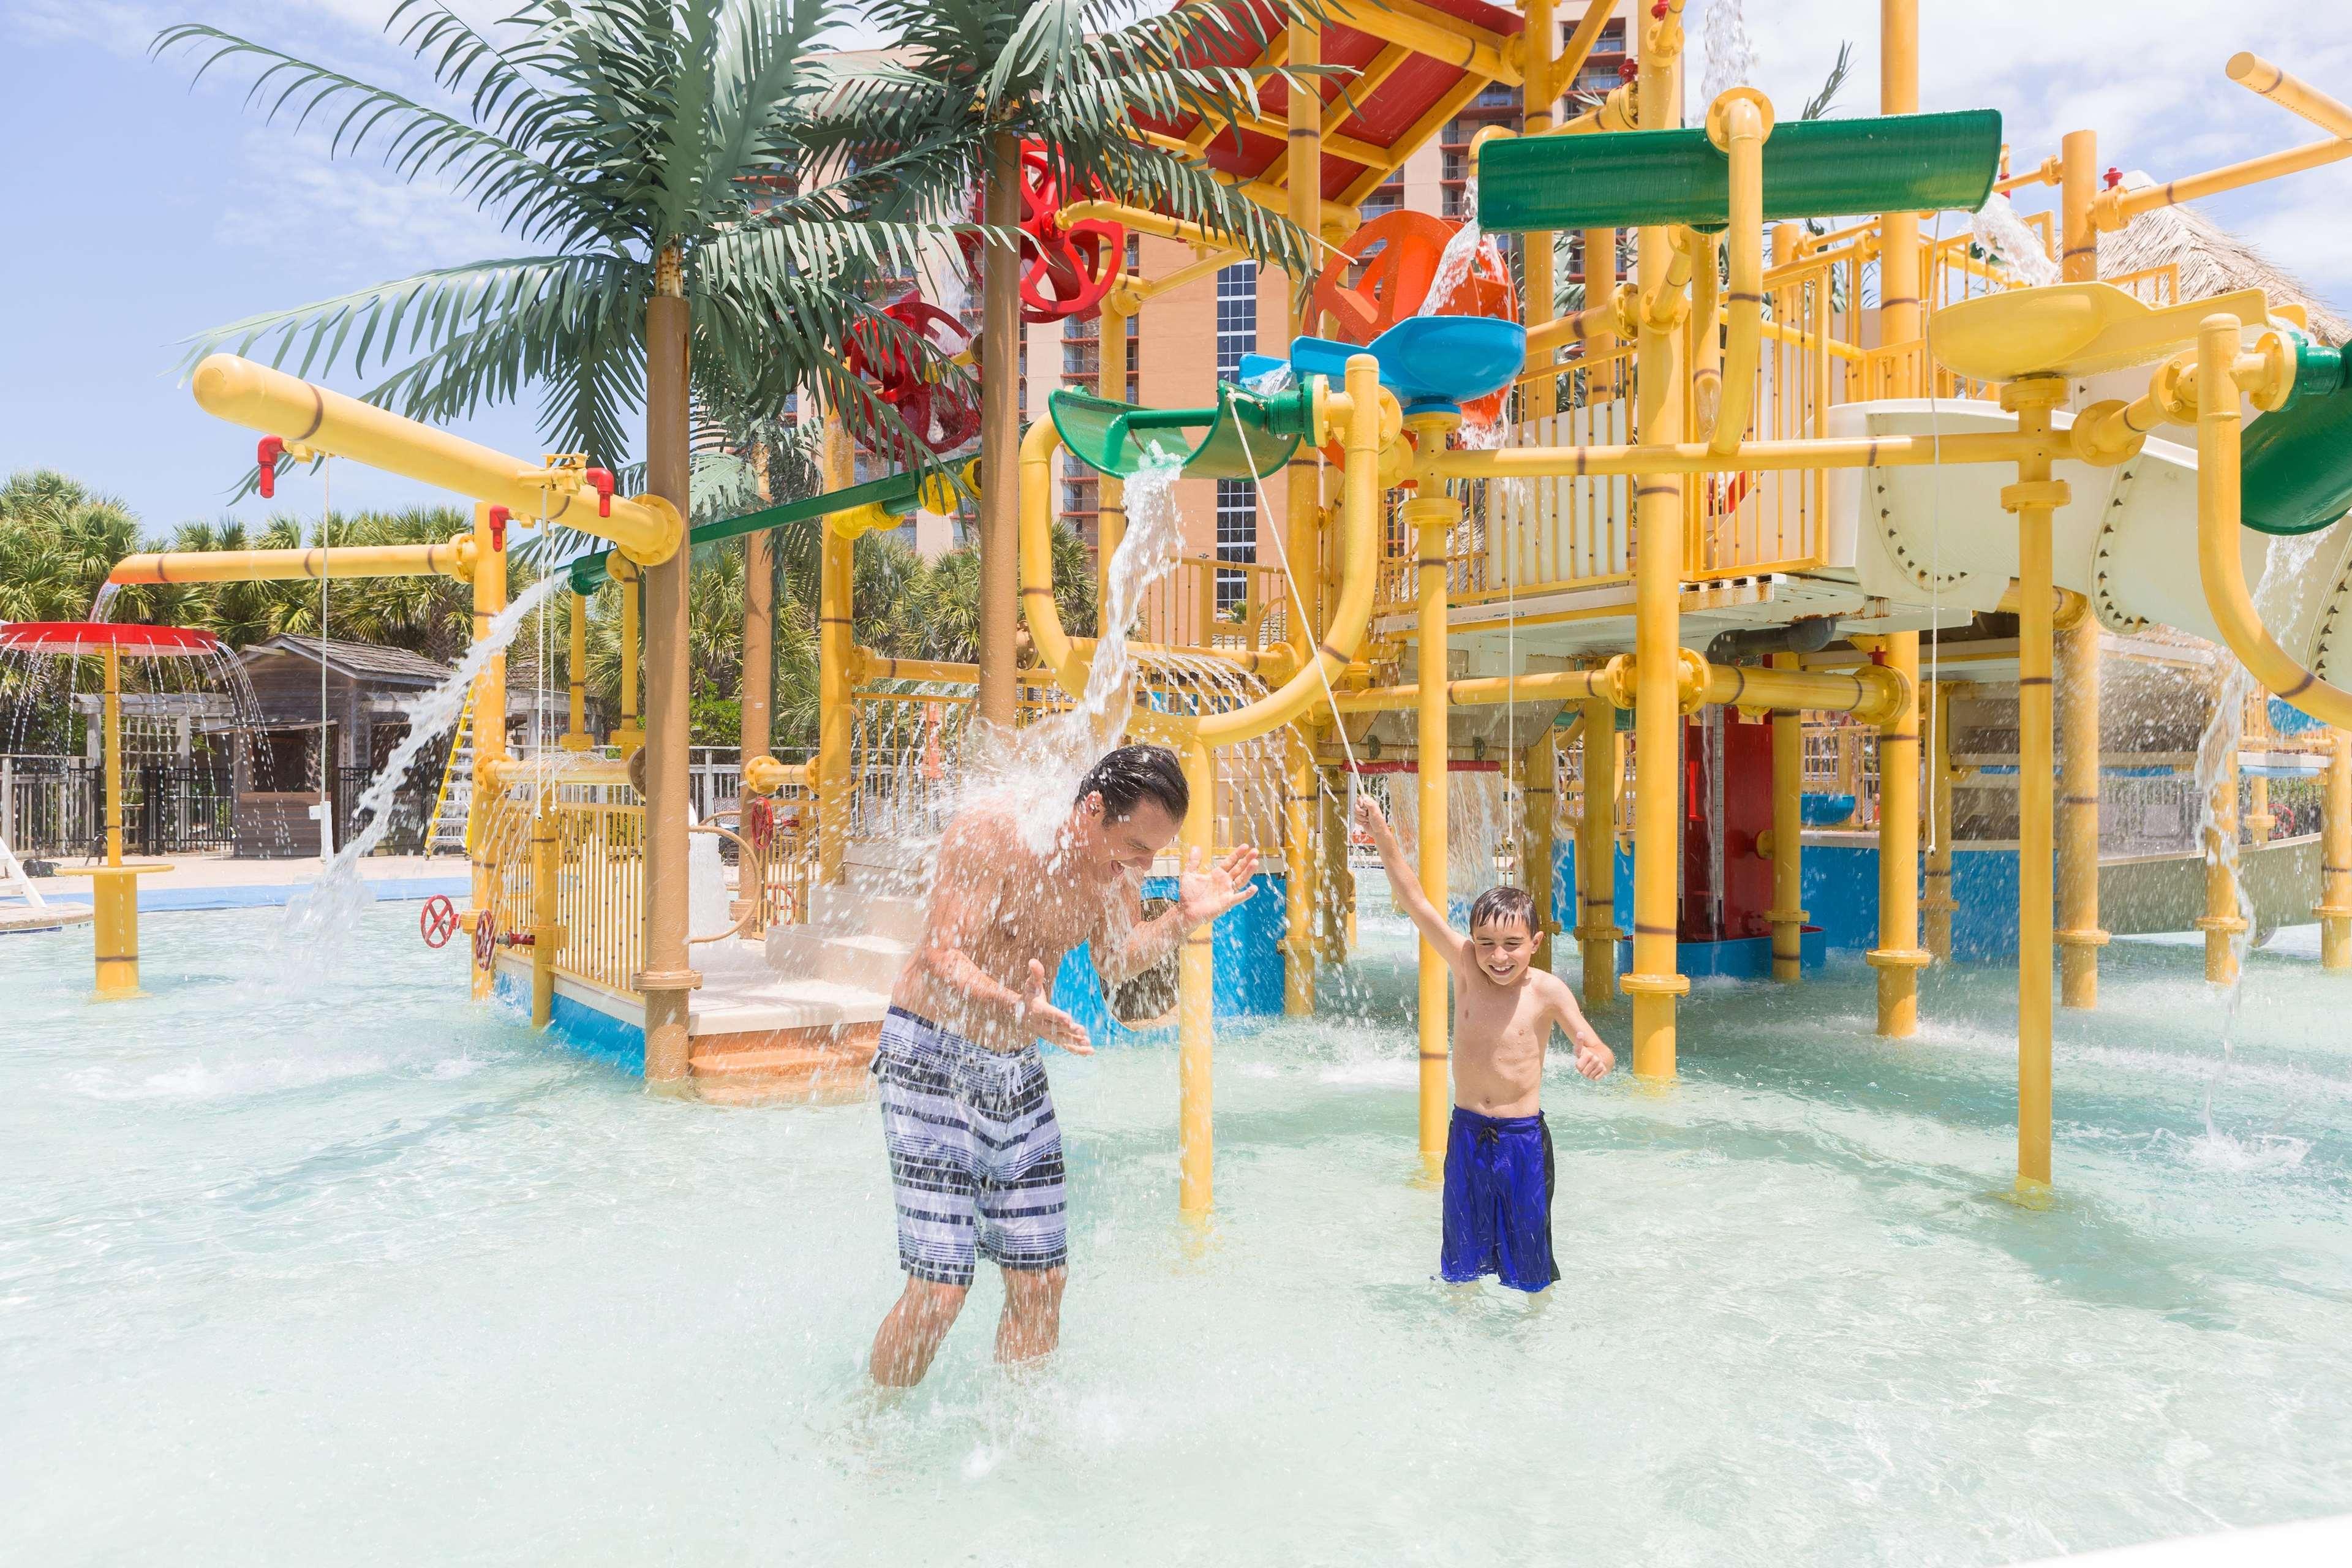 Embassy Suites by Hilton Myrtle Beach Oceanfront Resort